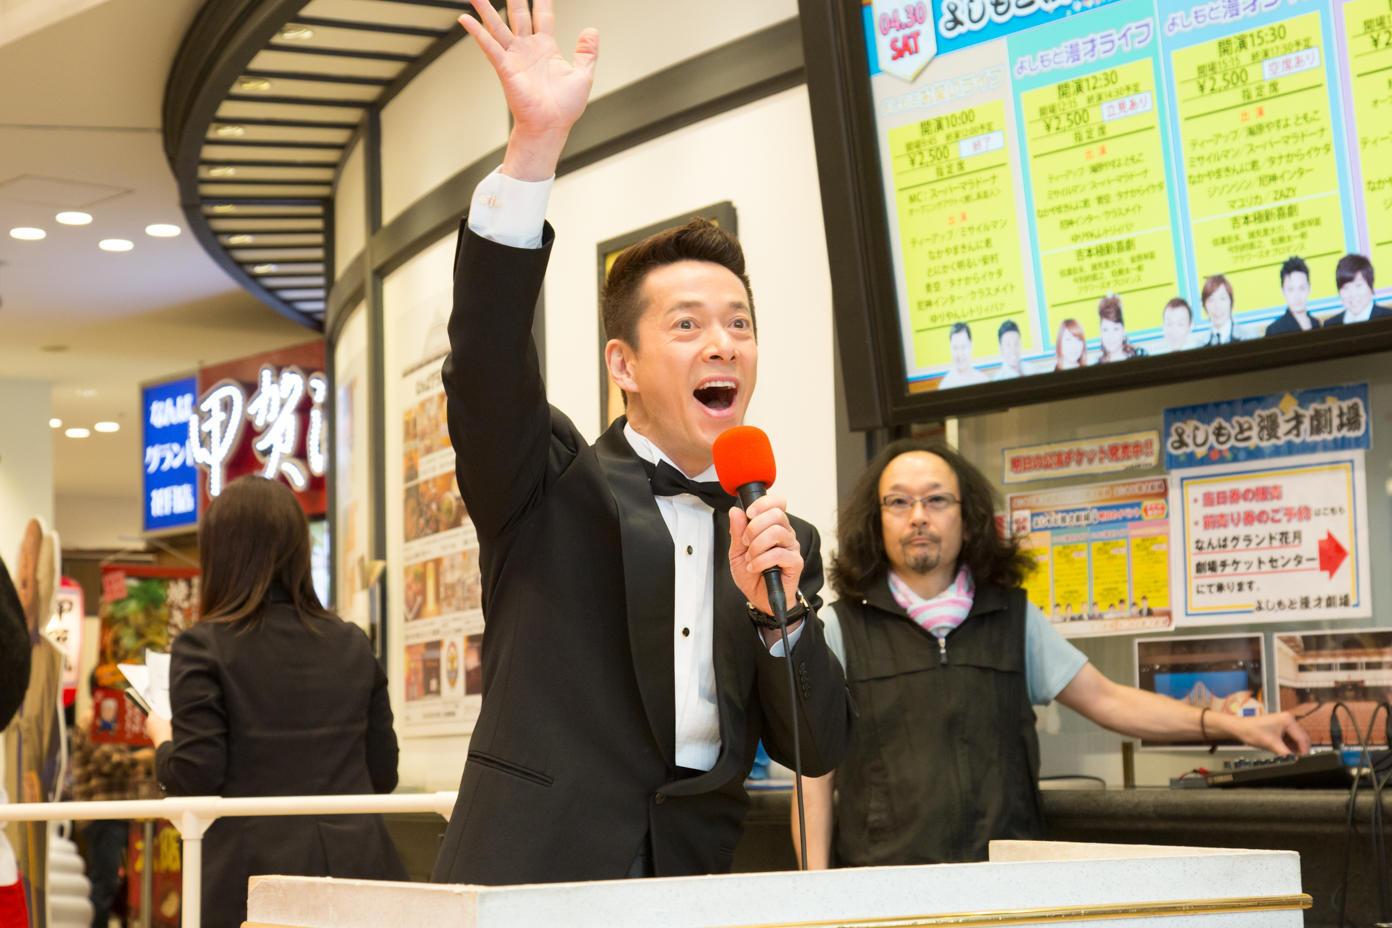 http://news.yoshimoto.co.jp/20160430154122-a337f500e140d9502585f375fb83709de49a8624.jpg